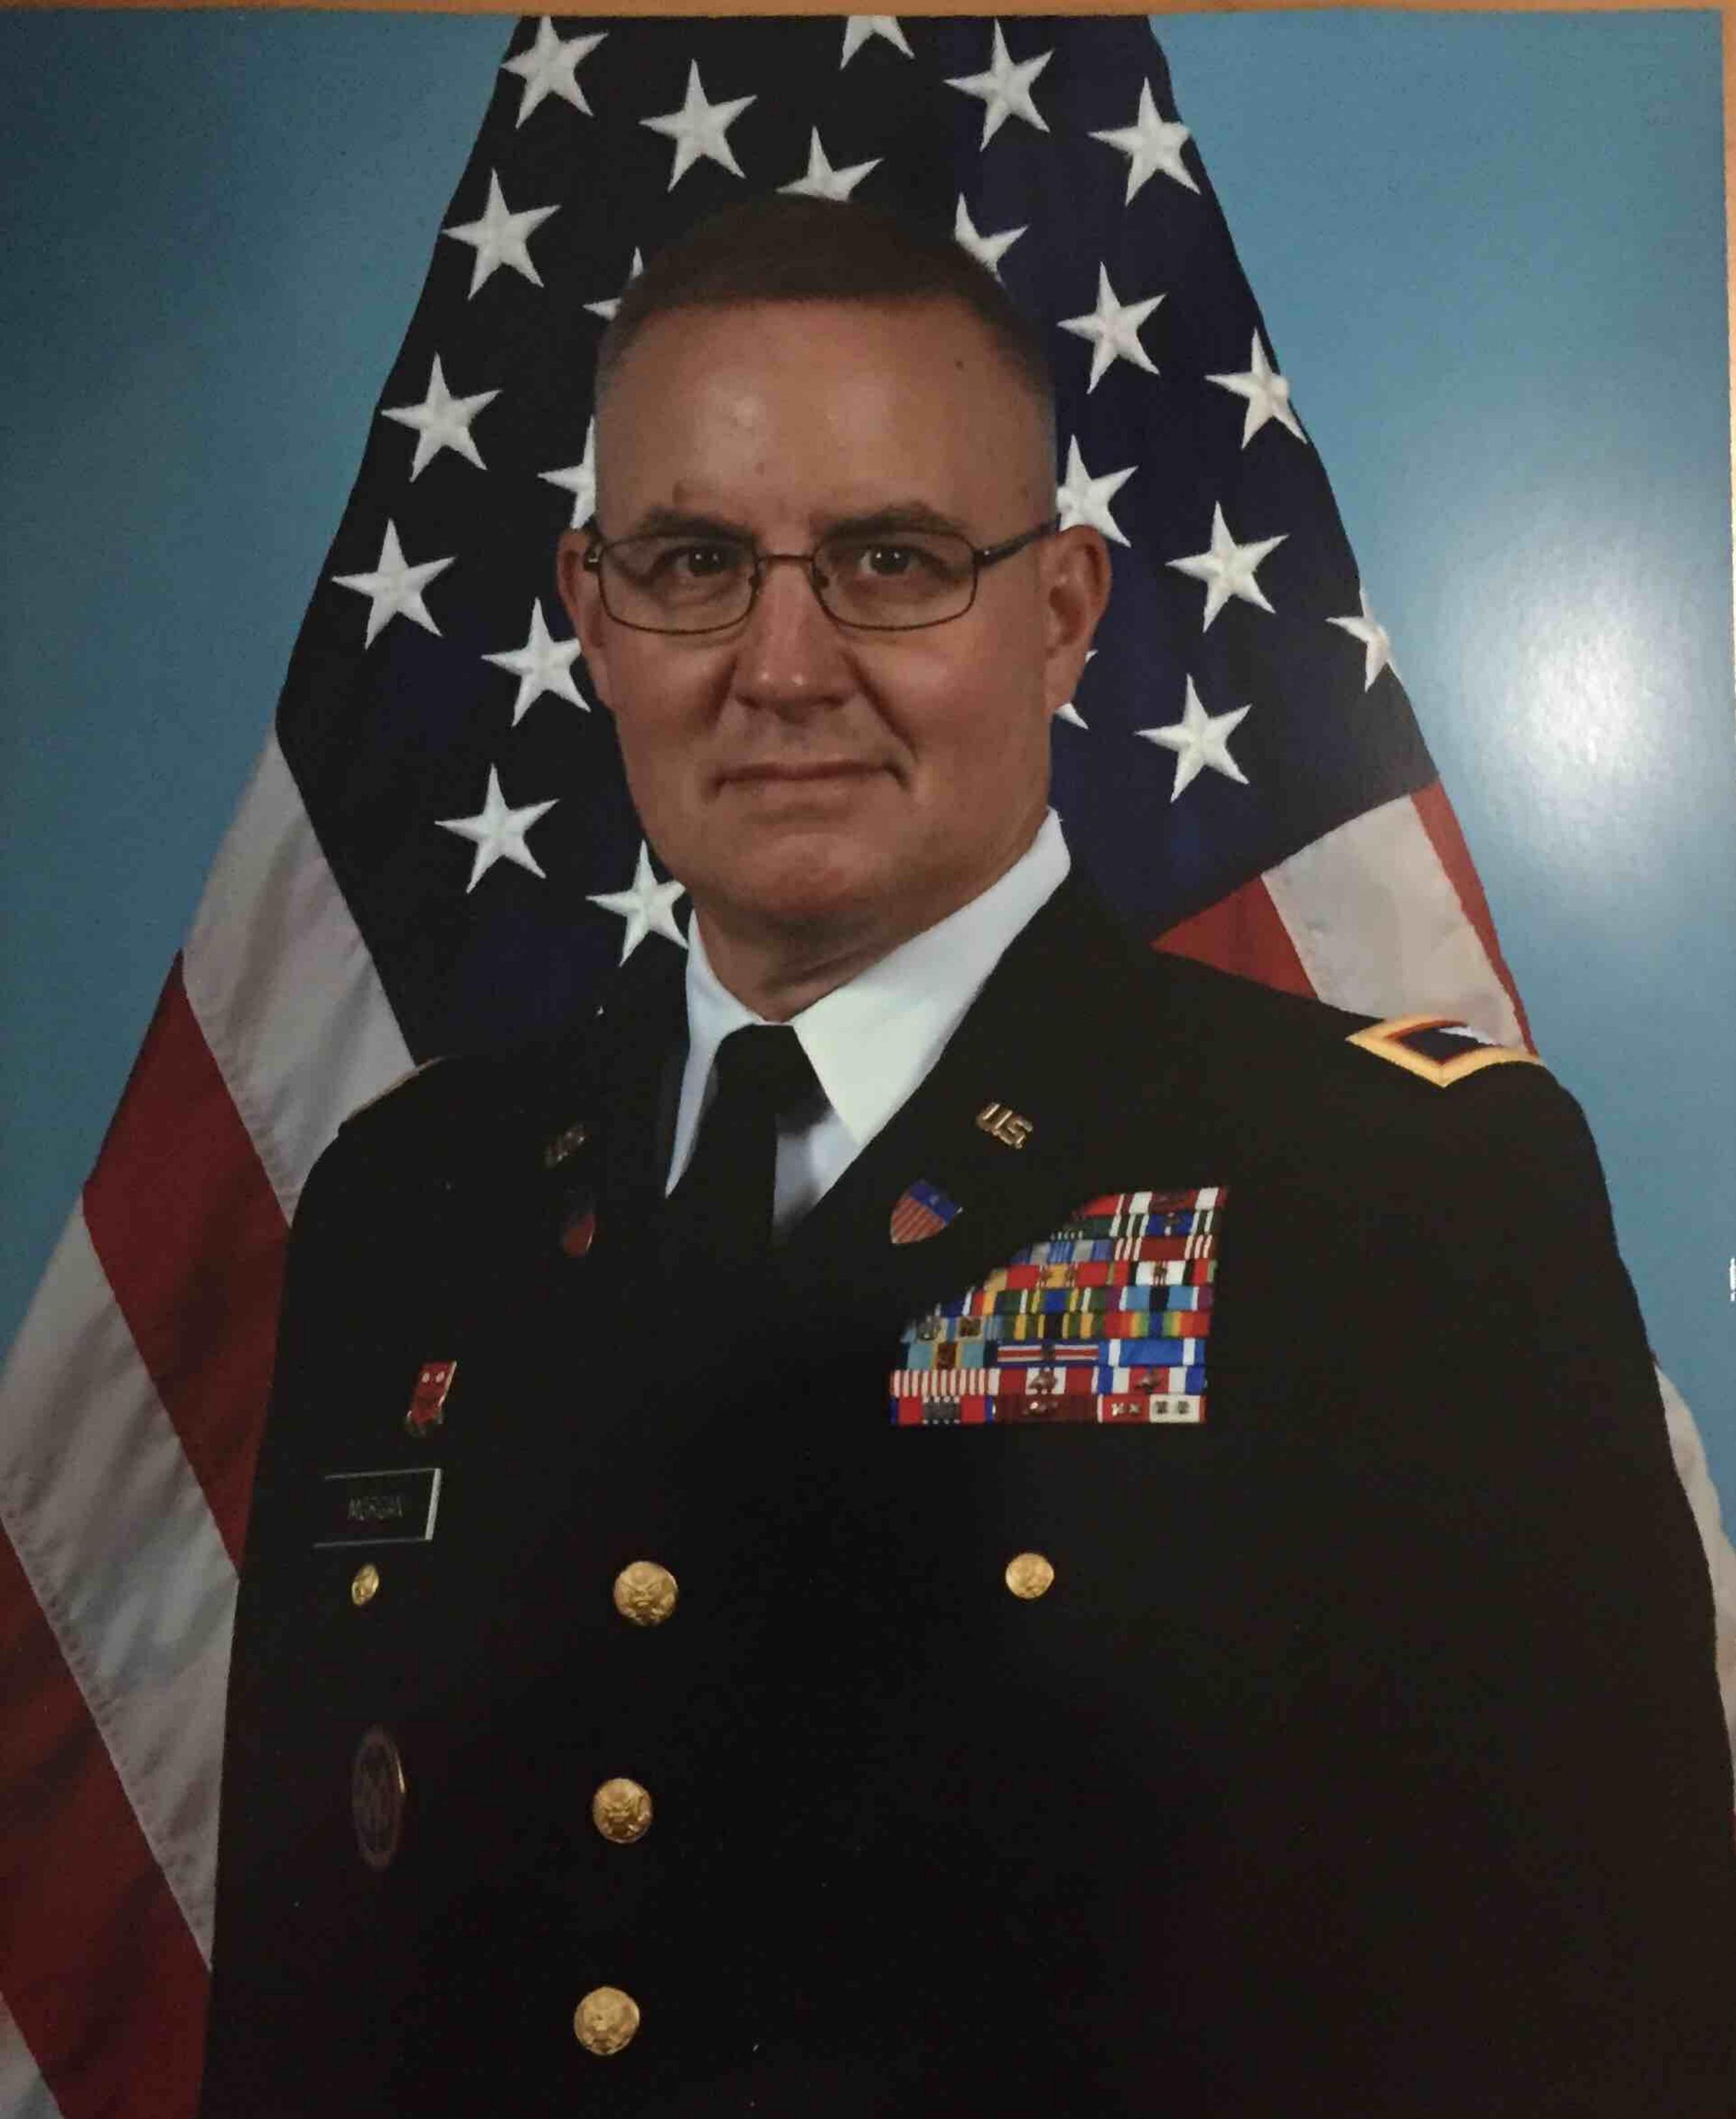 Jfhq alabama army national guard – USA Breaking News